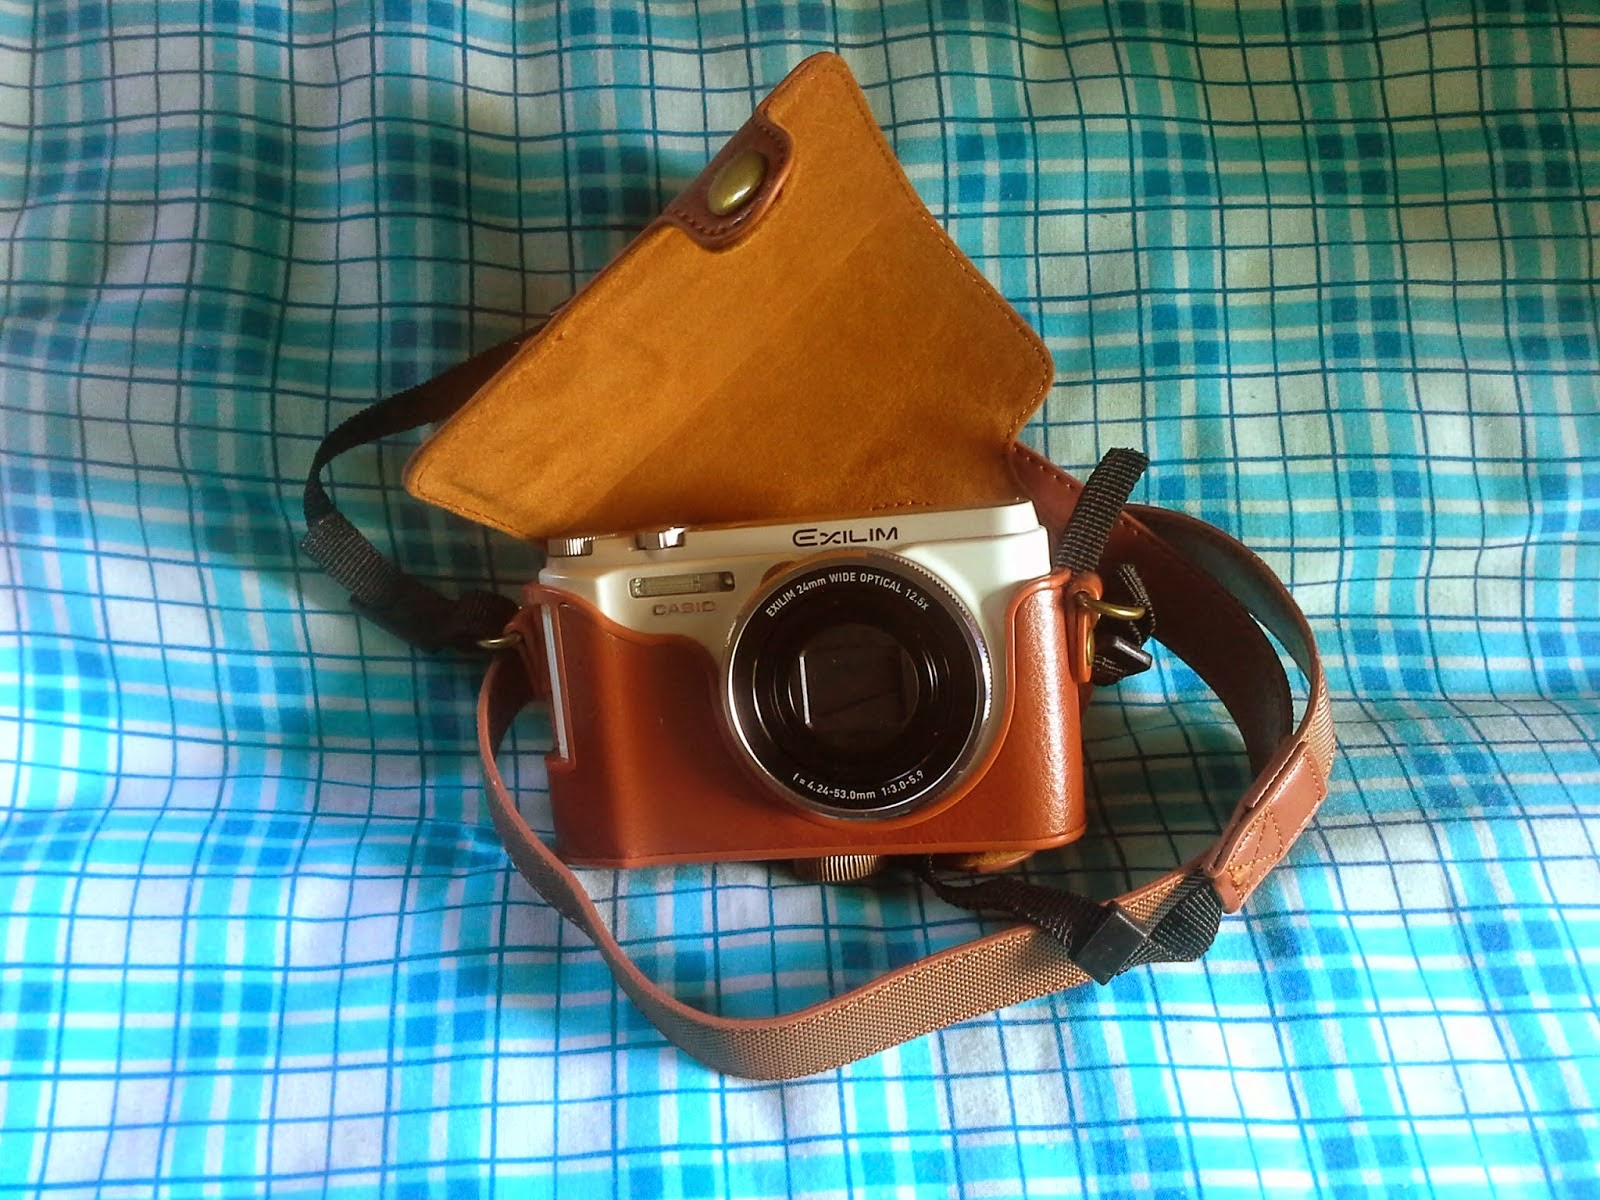 Review Beli Camera Cover Casio Exilim